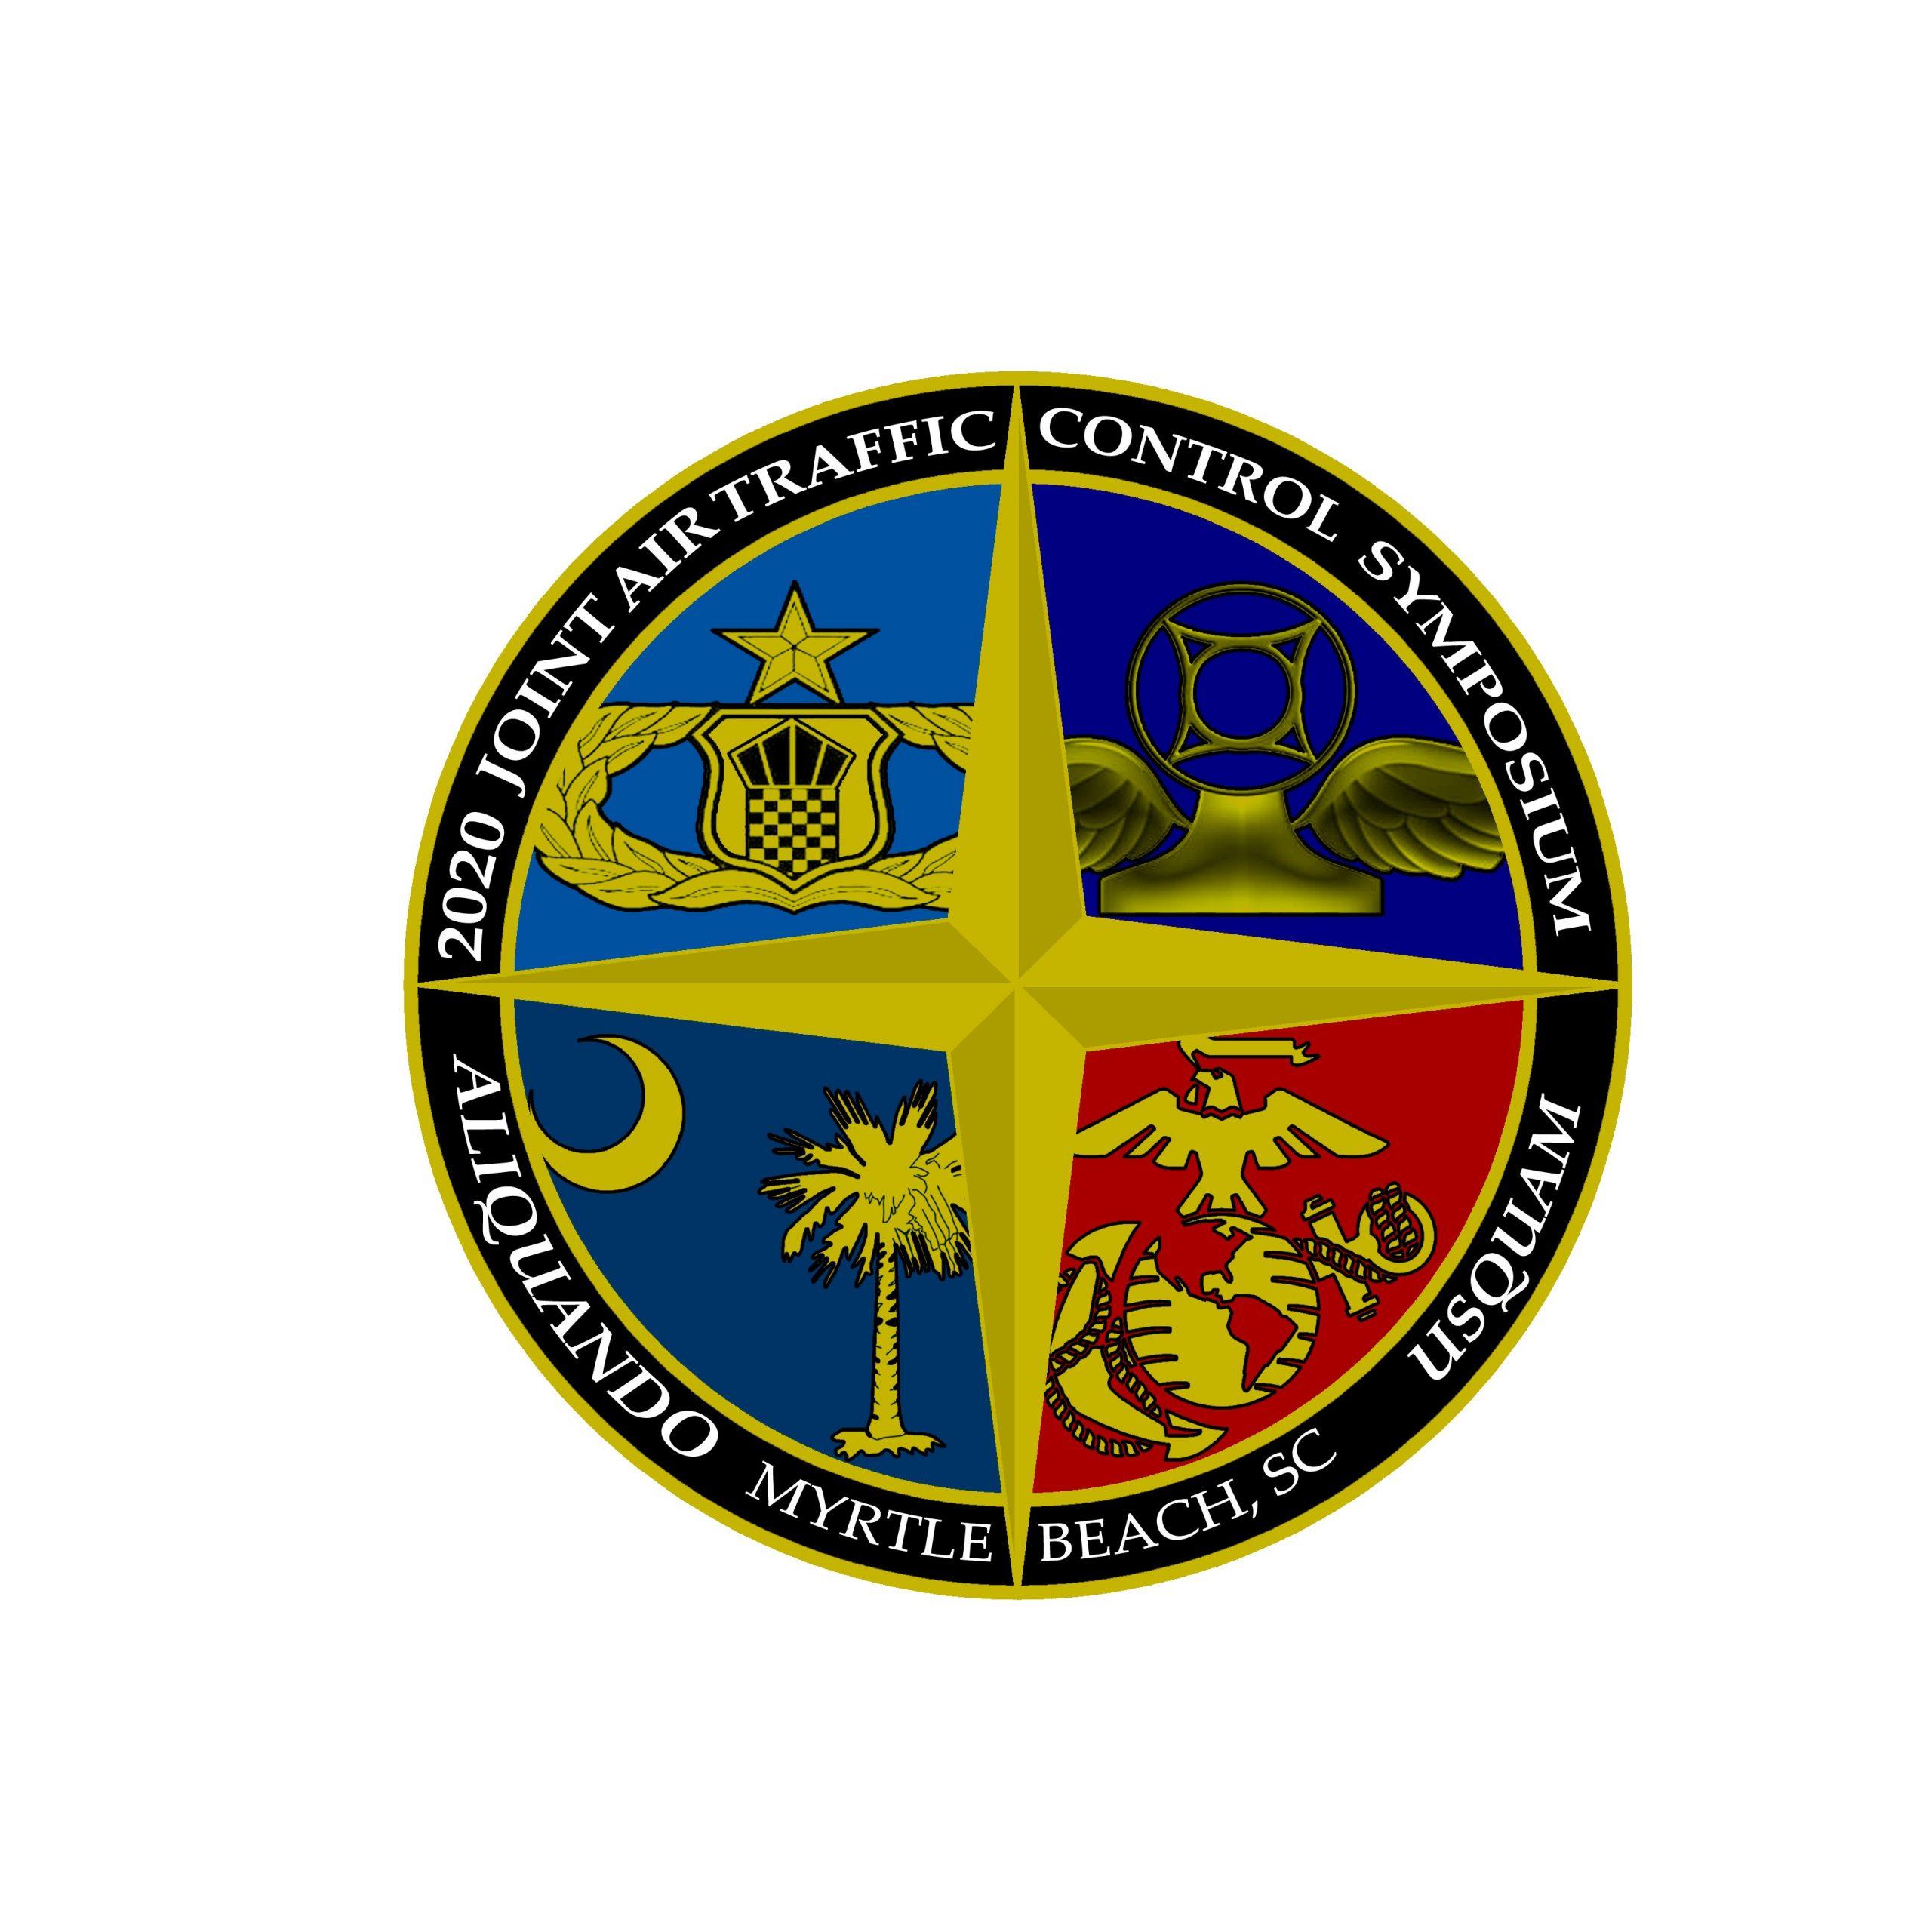 Joint Service ATC Symposium